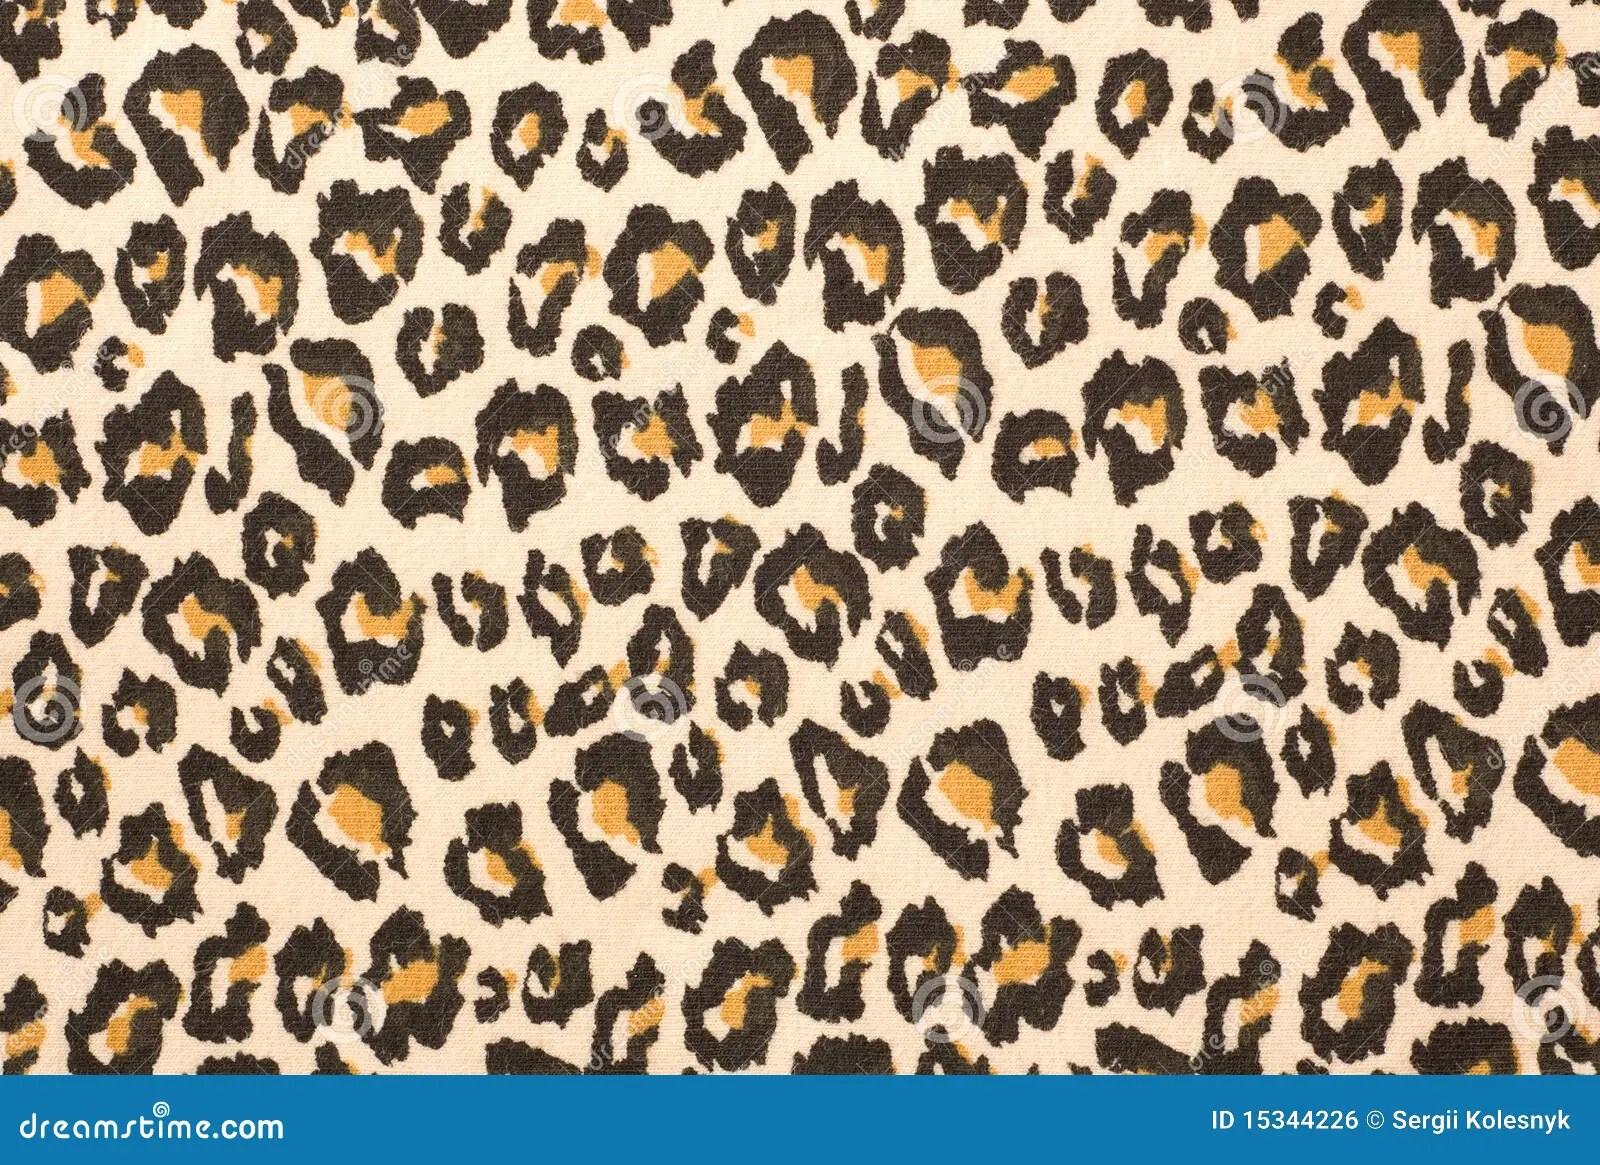 Zebra print powerpoint template choice image powerpoint template leopard print powerpoint template toneelgroepblik choice image toneelgroepblik Choice Image